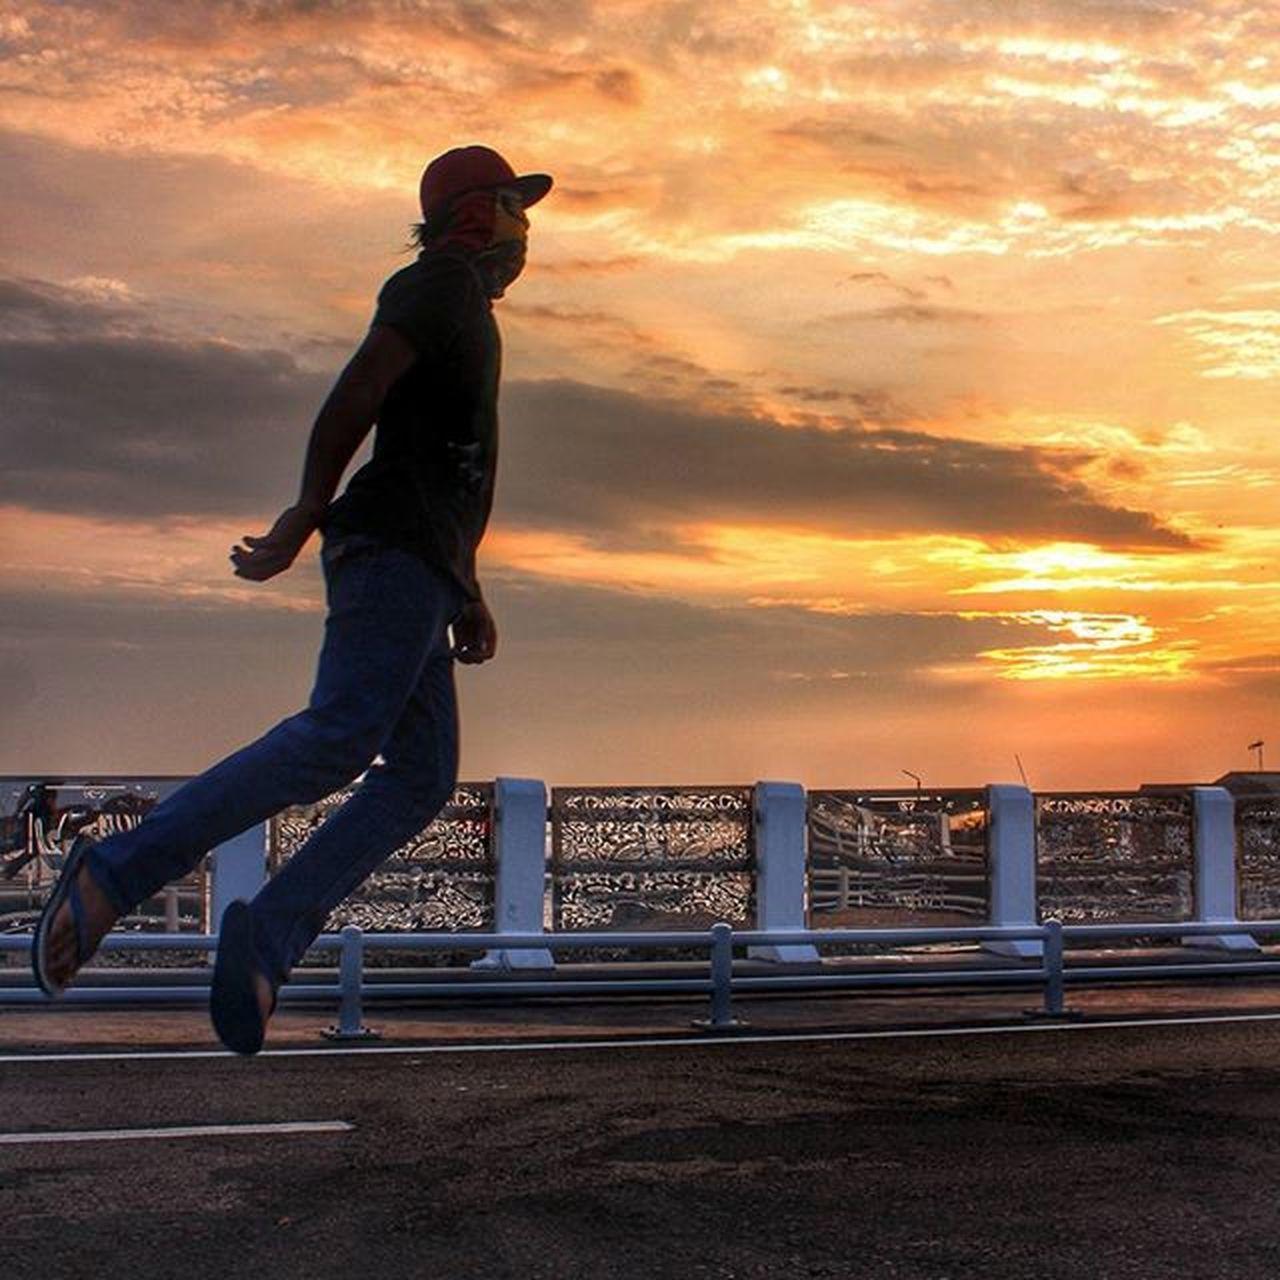 follow the direction of the wind location : Kenjeran lama, Surabaya Indonesia Levitation Levitation Photography Levitasihore Streetstyle Street Streetphotography Levitasi Levity In Action Levitation2015 People